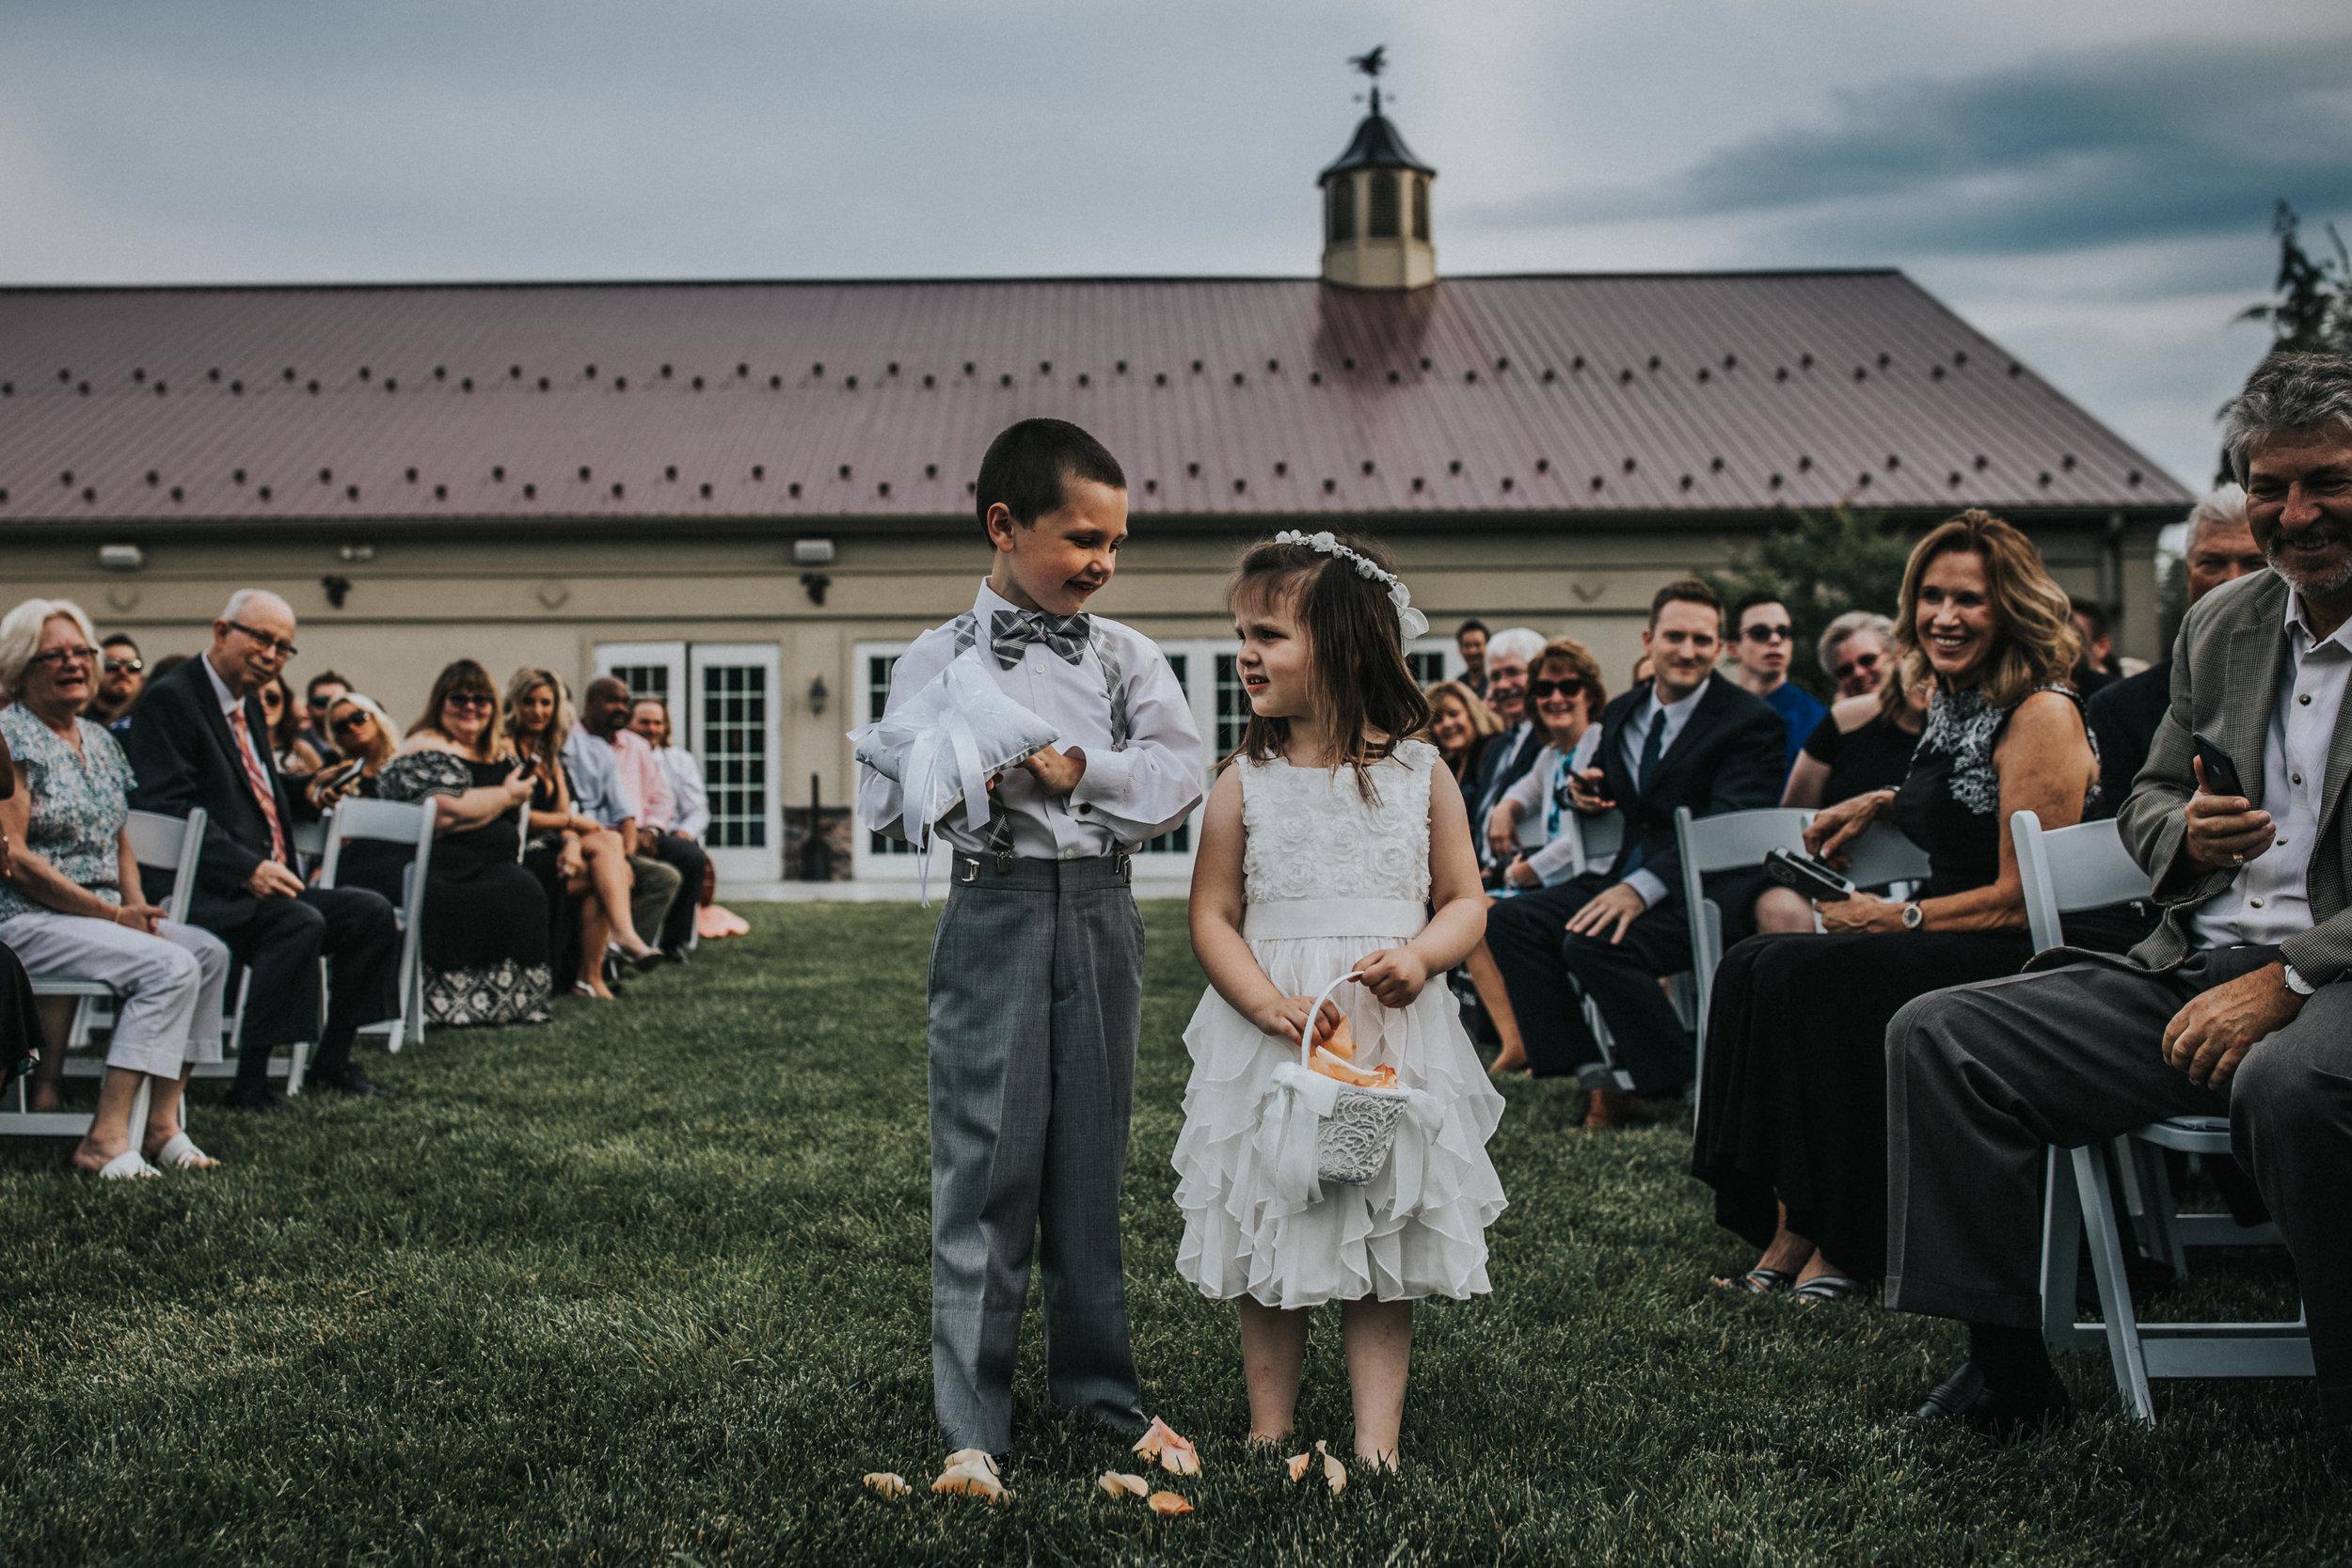 New-Jersey-Wedding-Photographer-JennaLynnPhotography-ValenzanoWinery-Ceremony-32.jpg